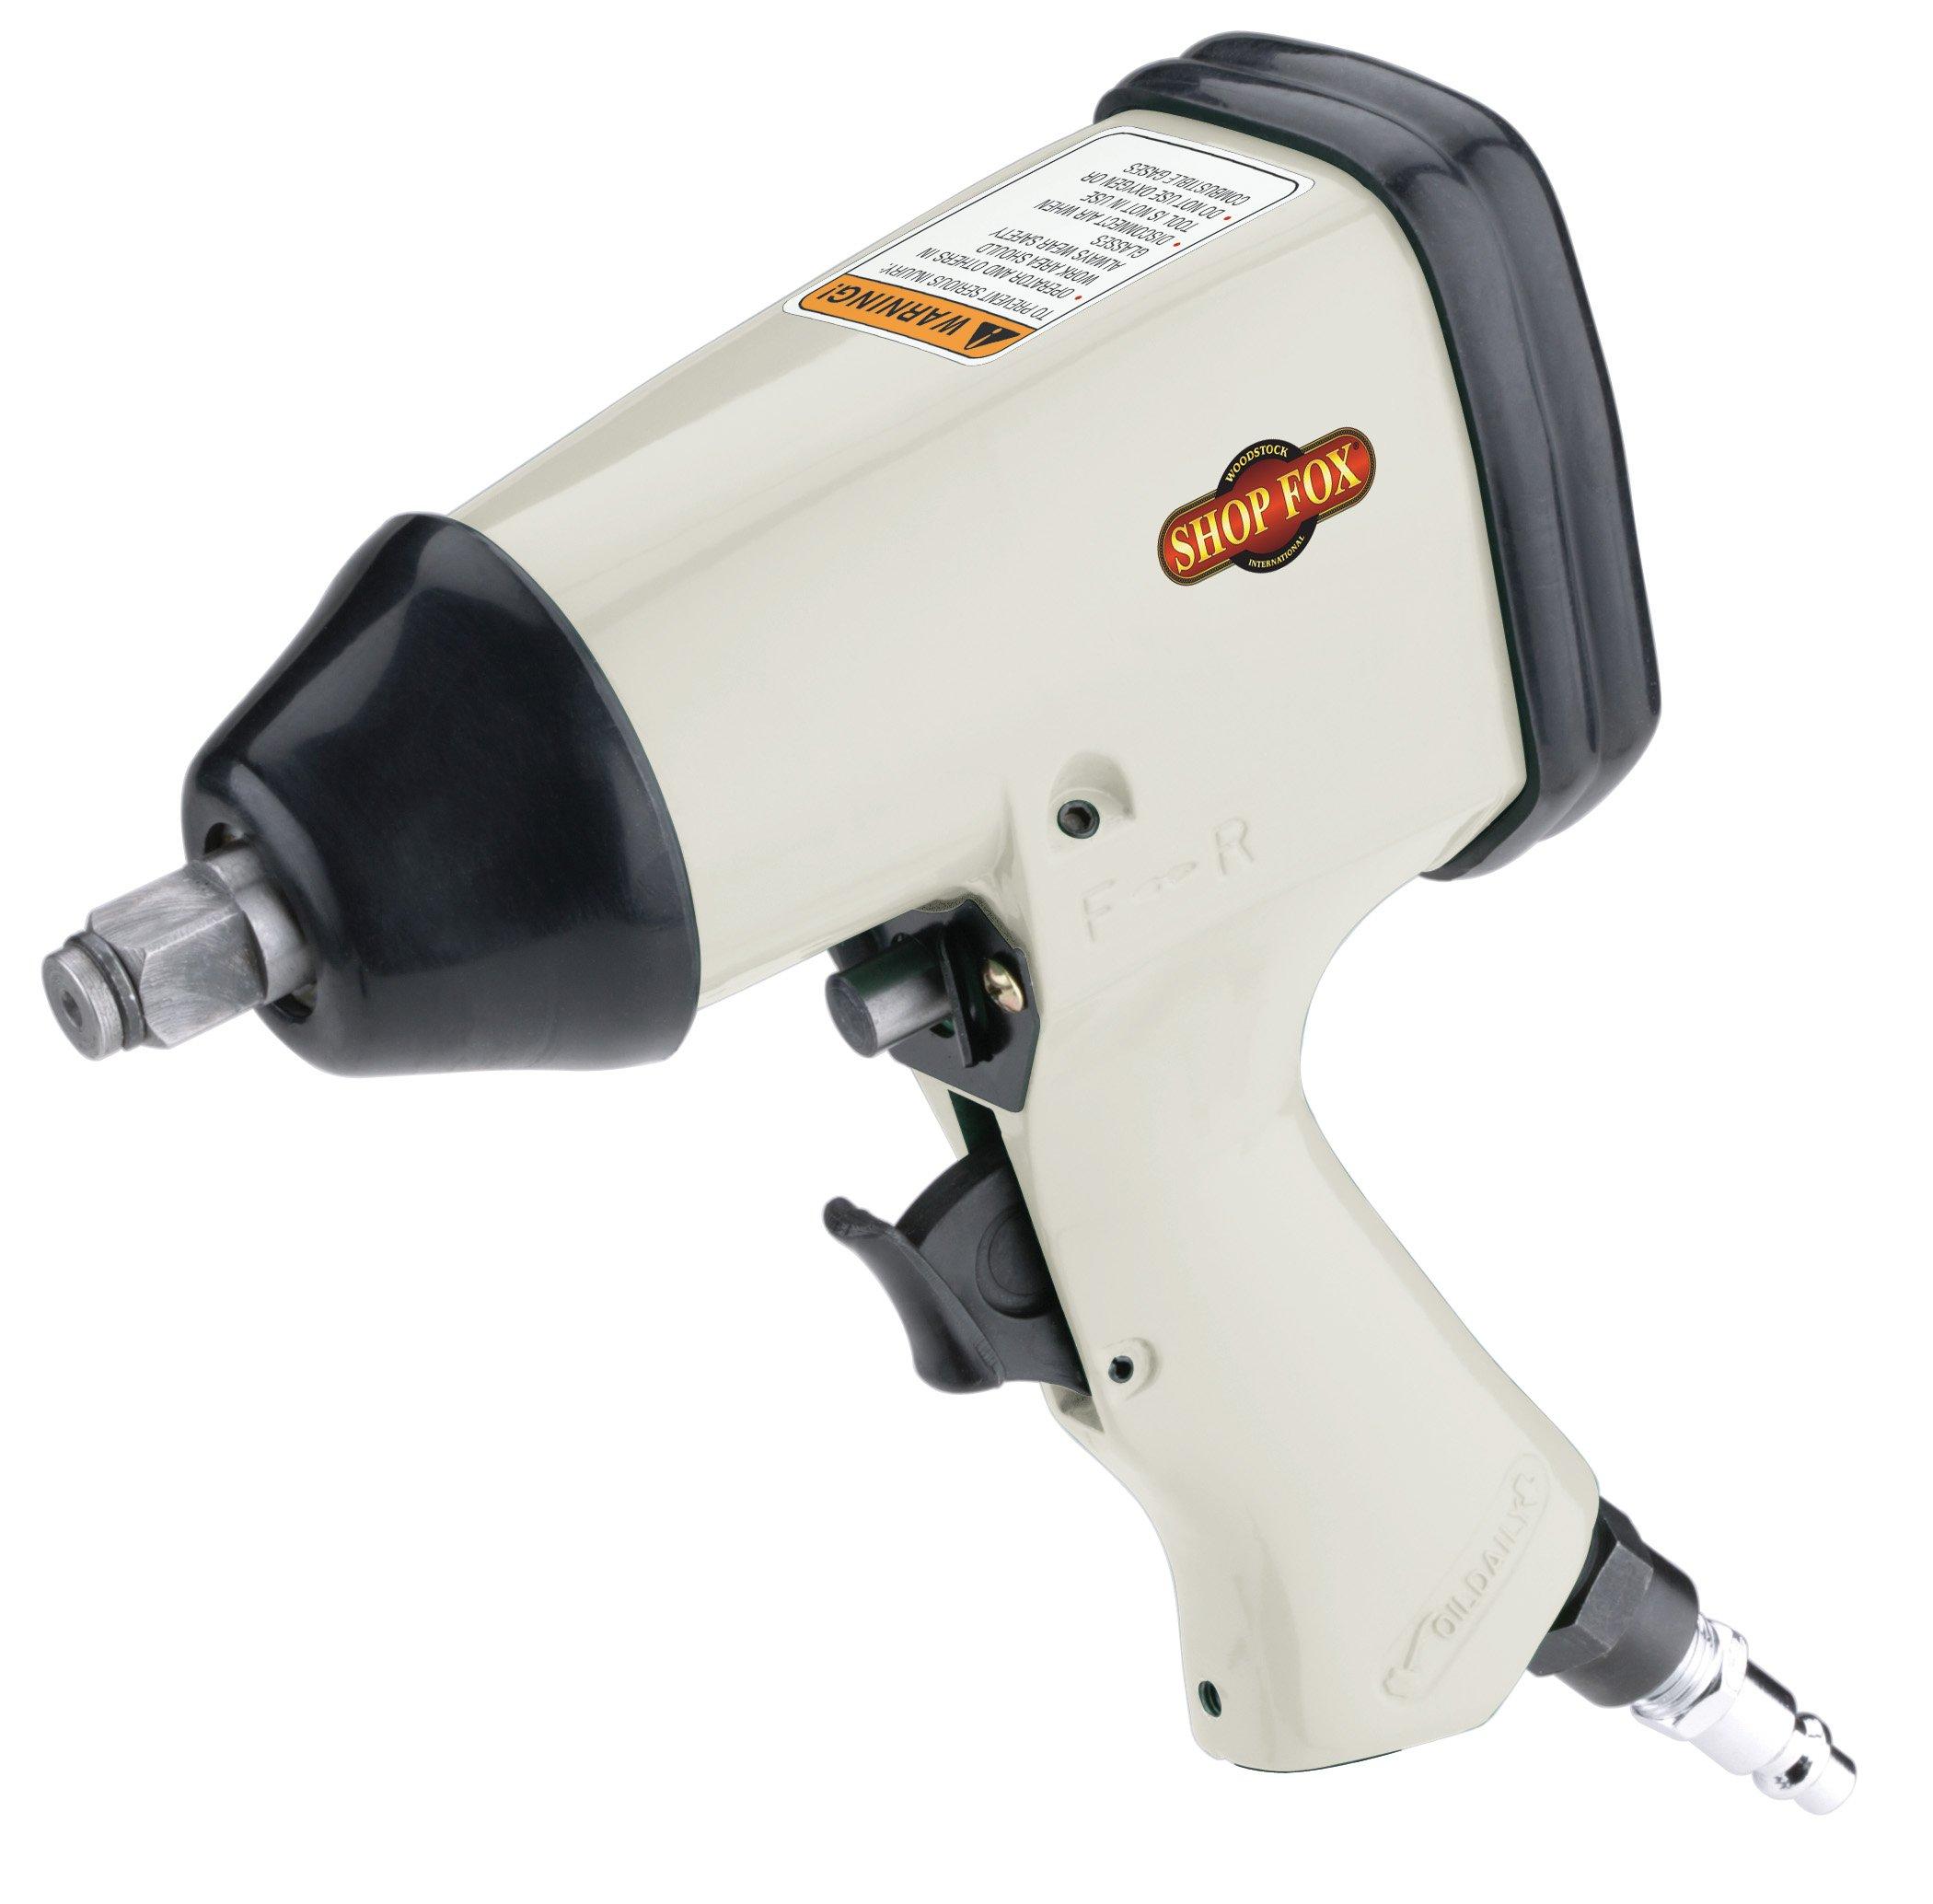 Shop Fox W1789 1/2-Inch Impact Wrench